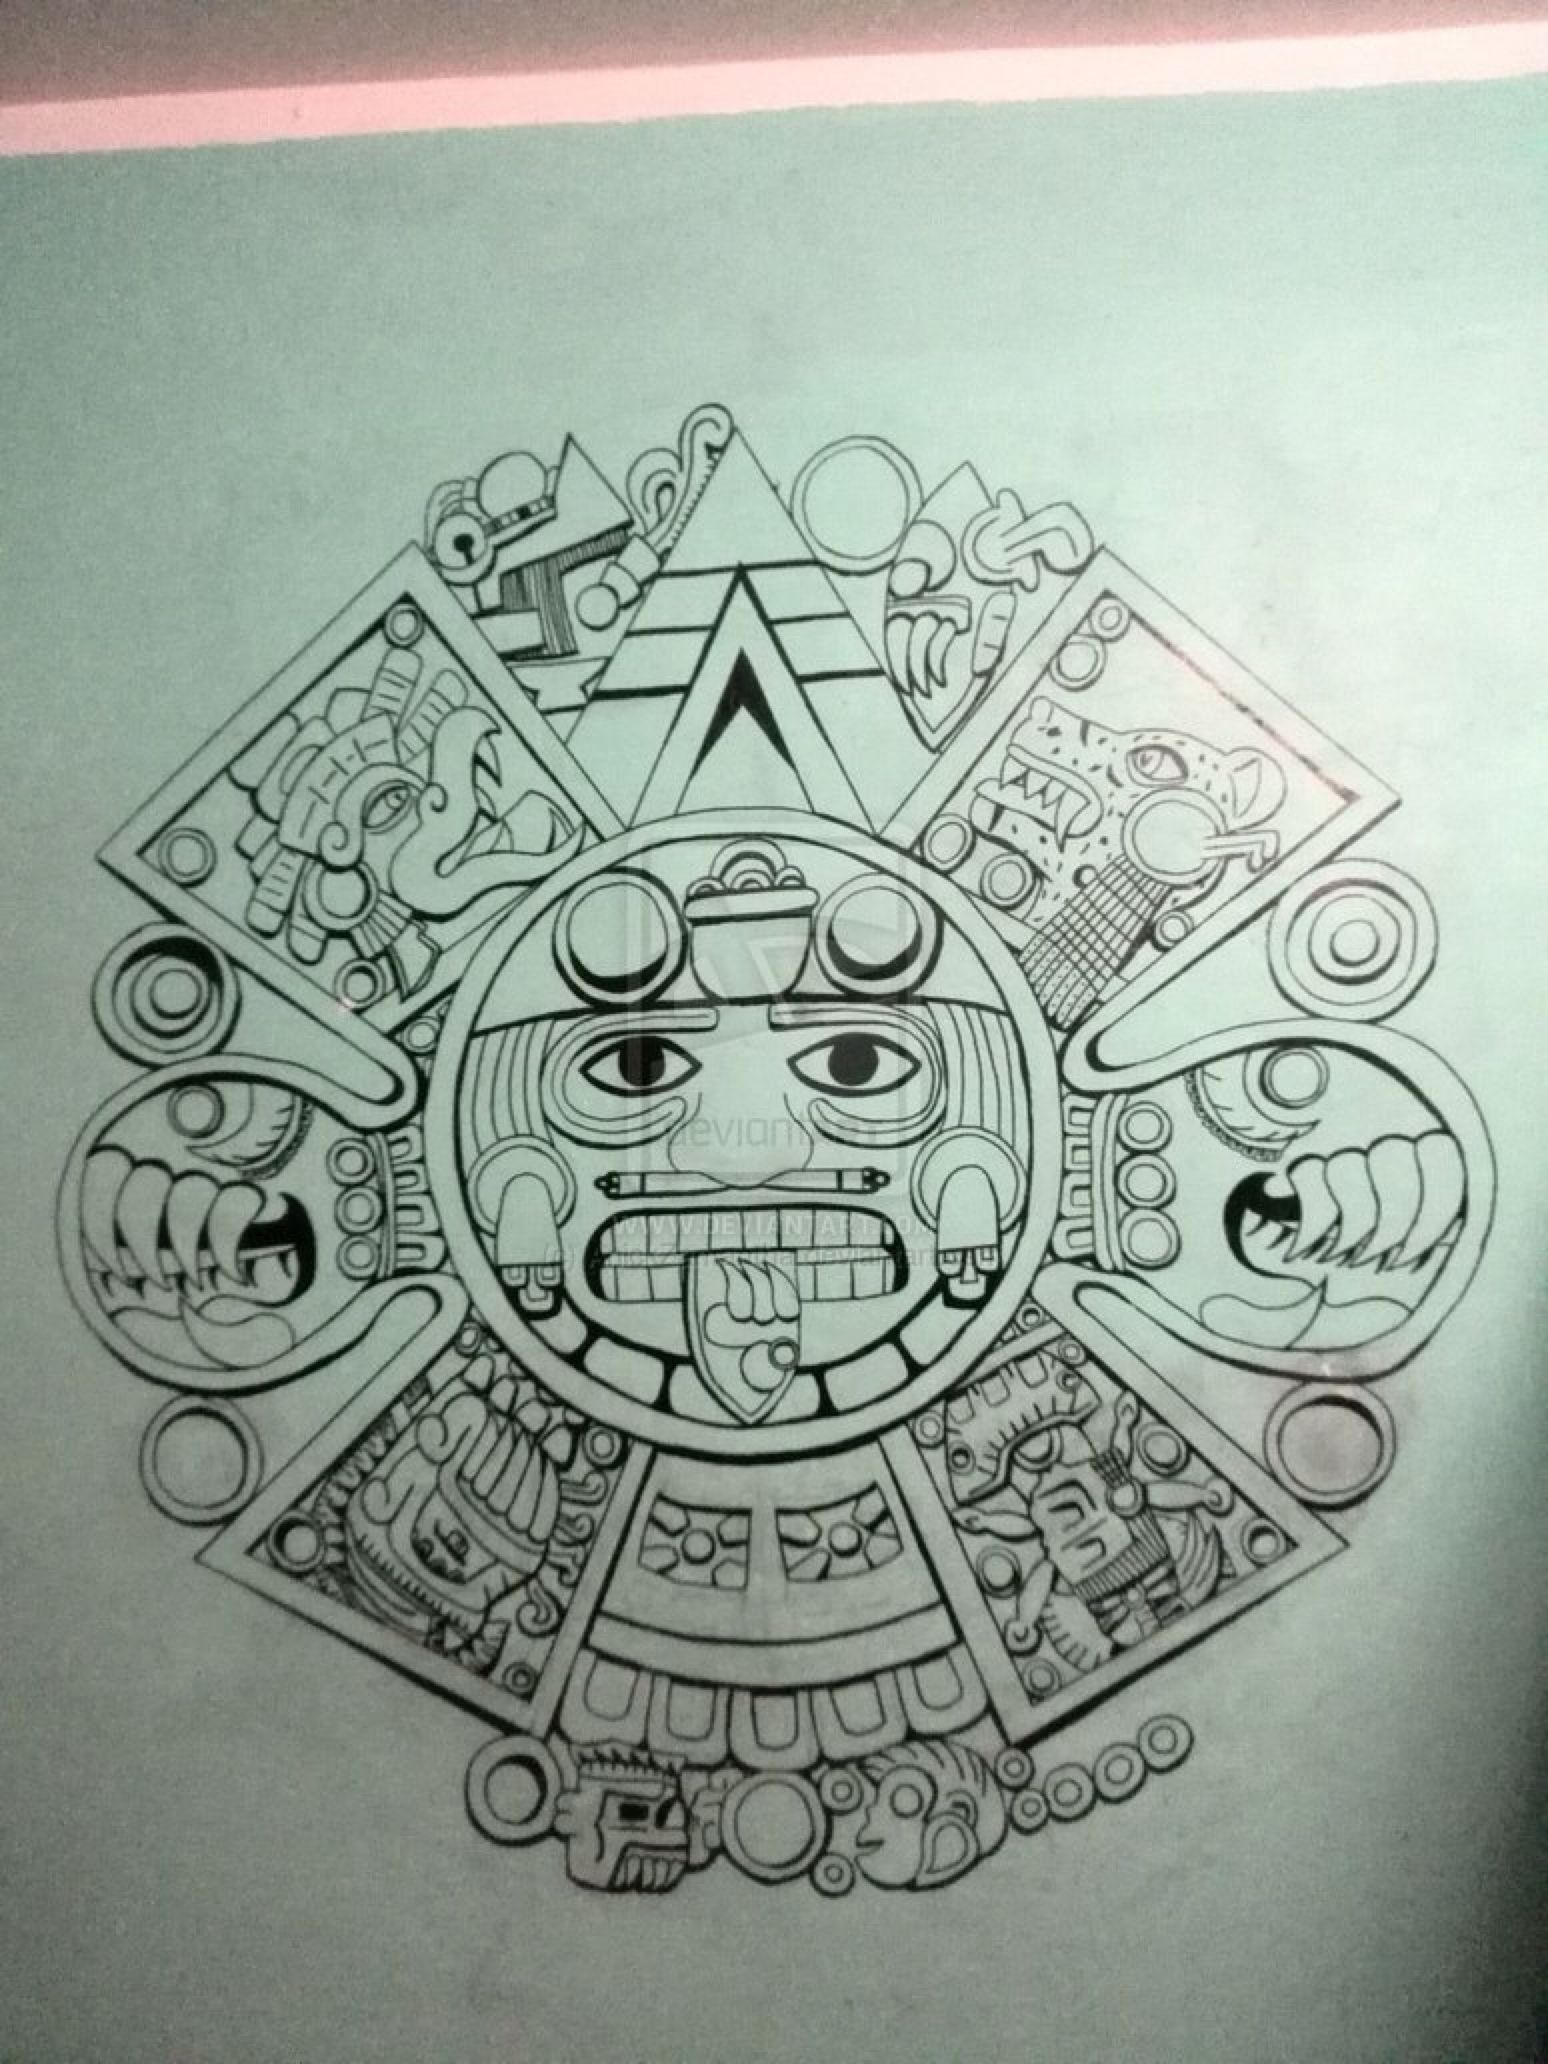 Calendar Drawing Design : Pin by juan soria on aztec tattoo for men pinterest